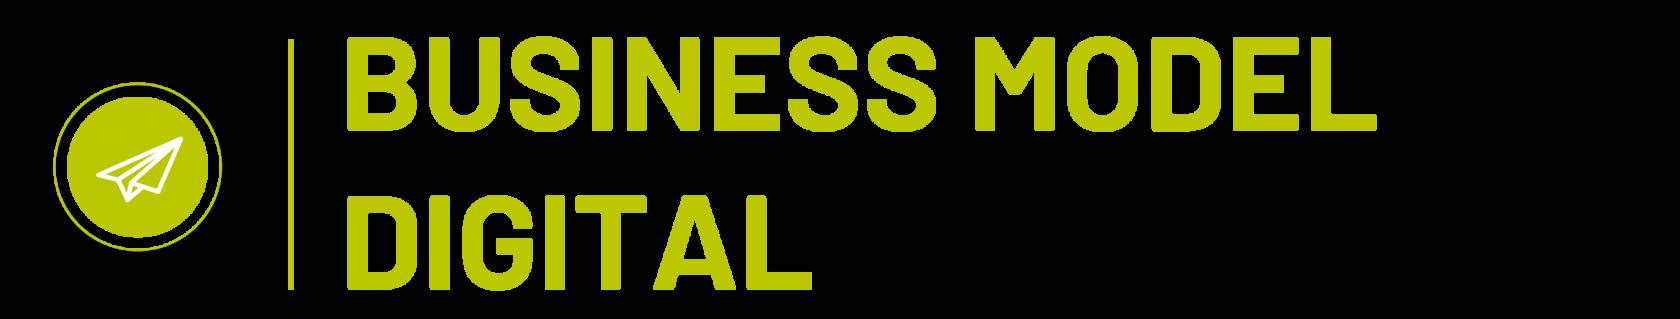 Header BUSINESSMODELDIGITALcerchio-01-01